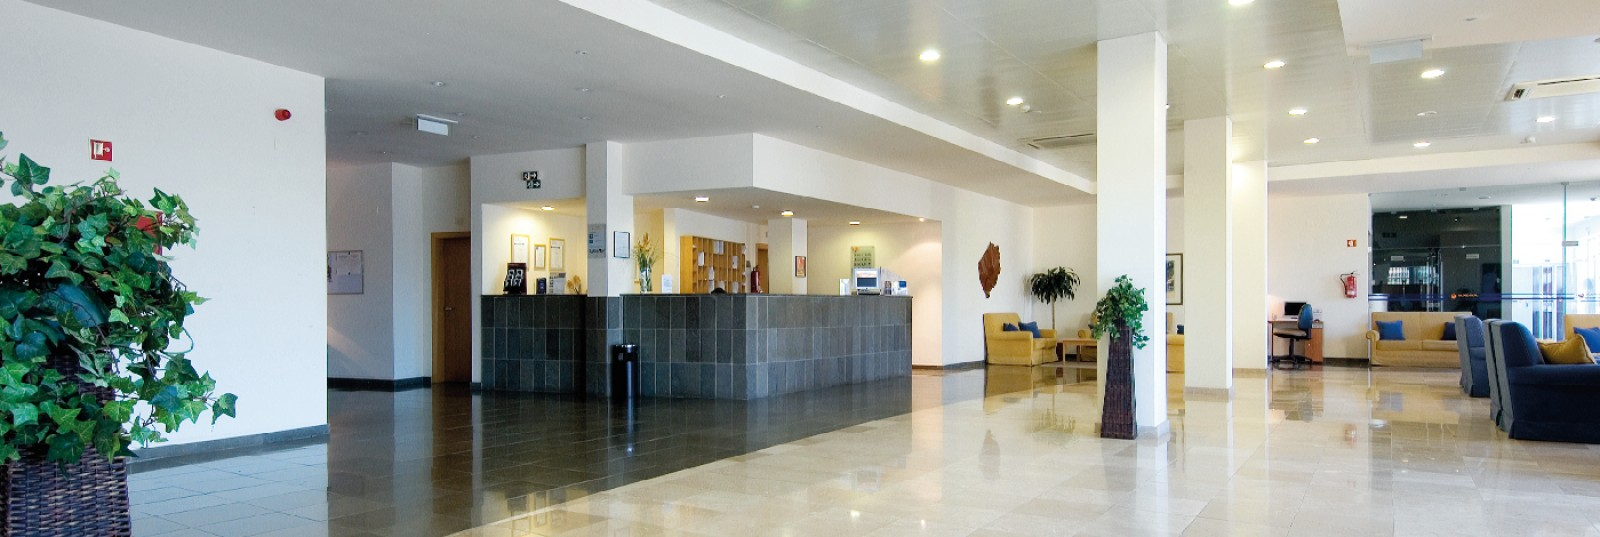 Hotel Eurosol Alcanena - Reception